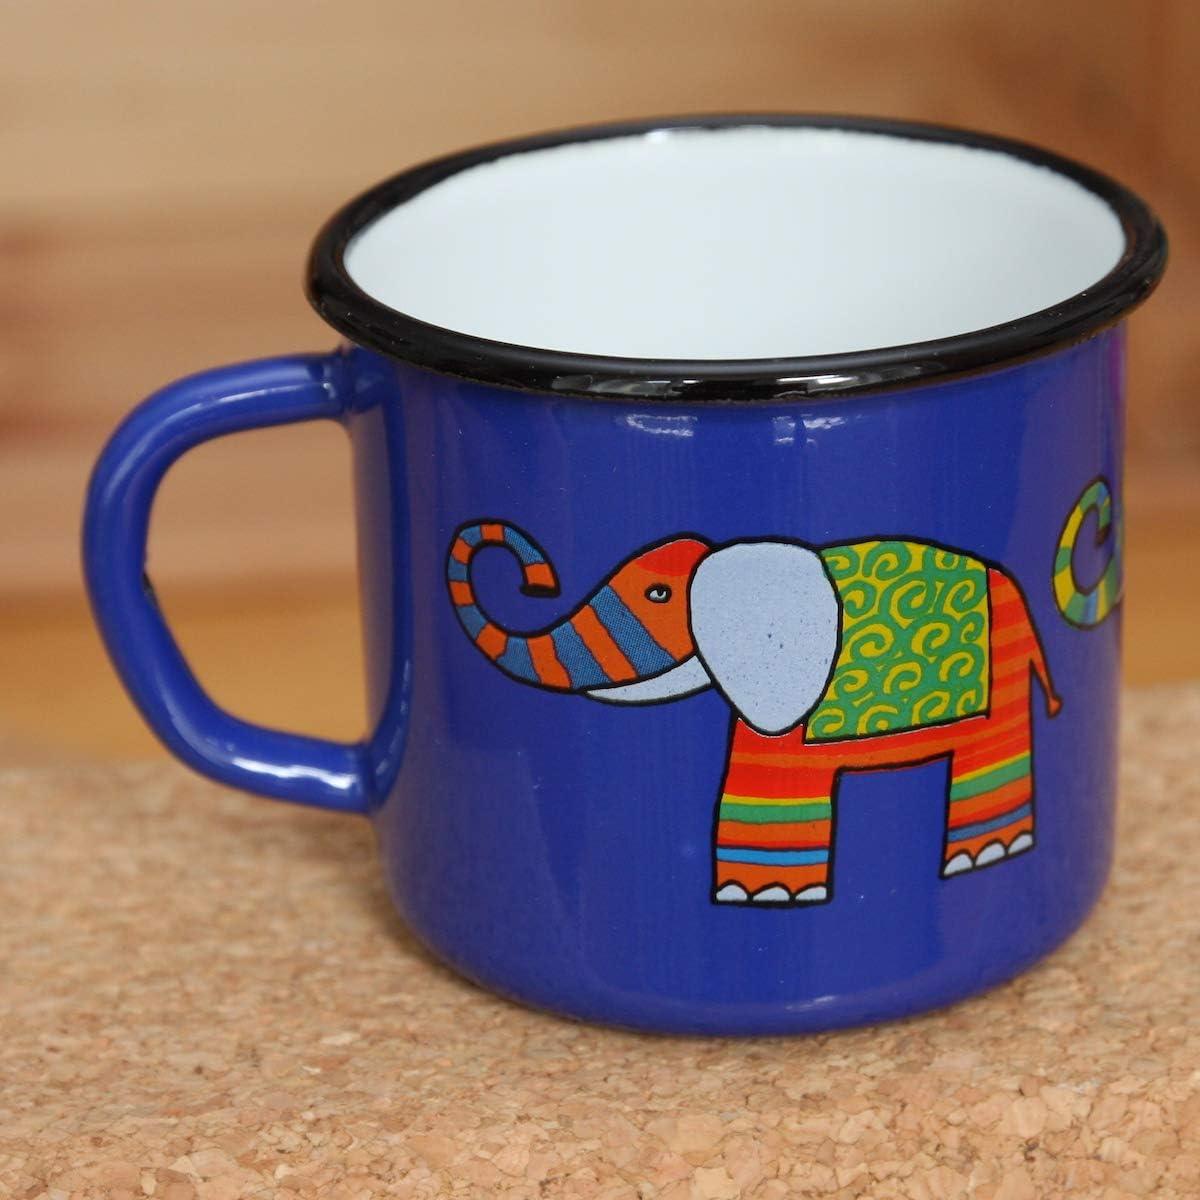 Robusta e inquebrantable Ligera 250 ml Smaltum Una Taza Turquesa Elefantee para ni/ños o Camping